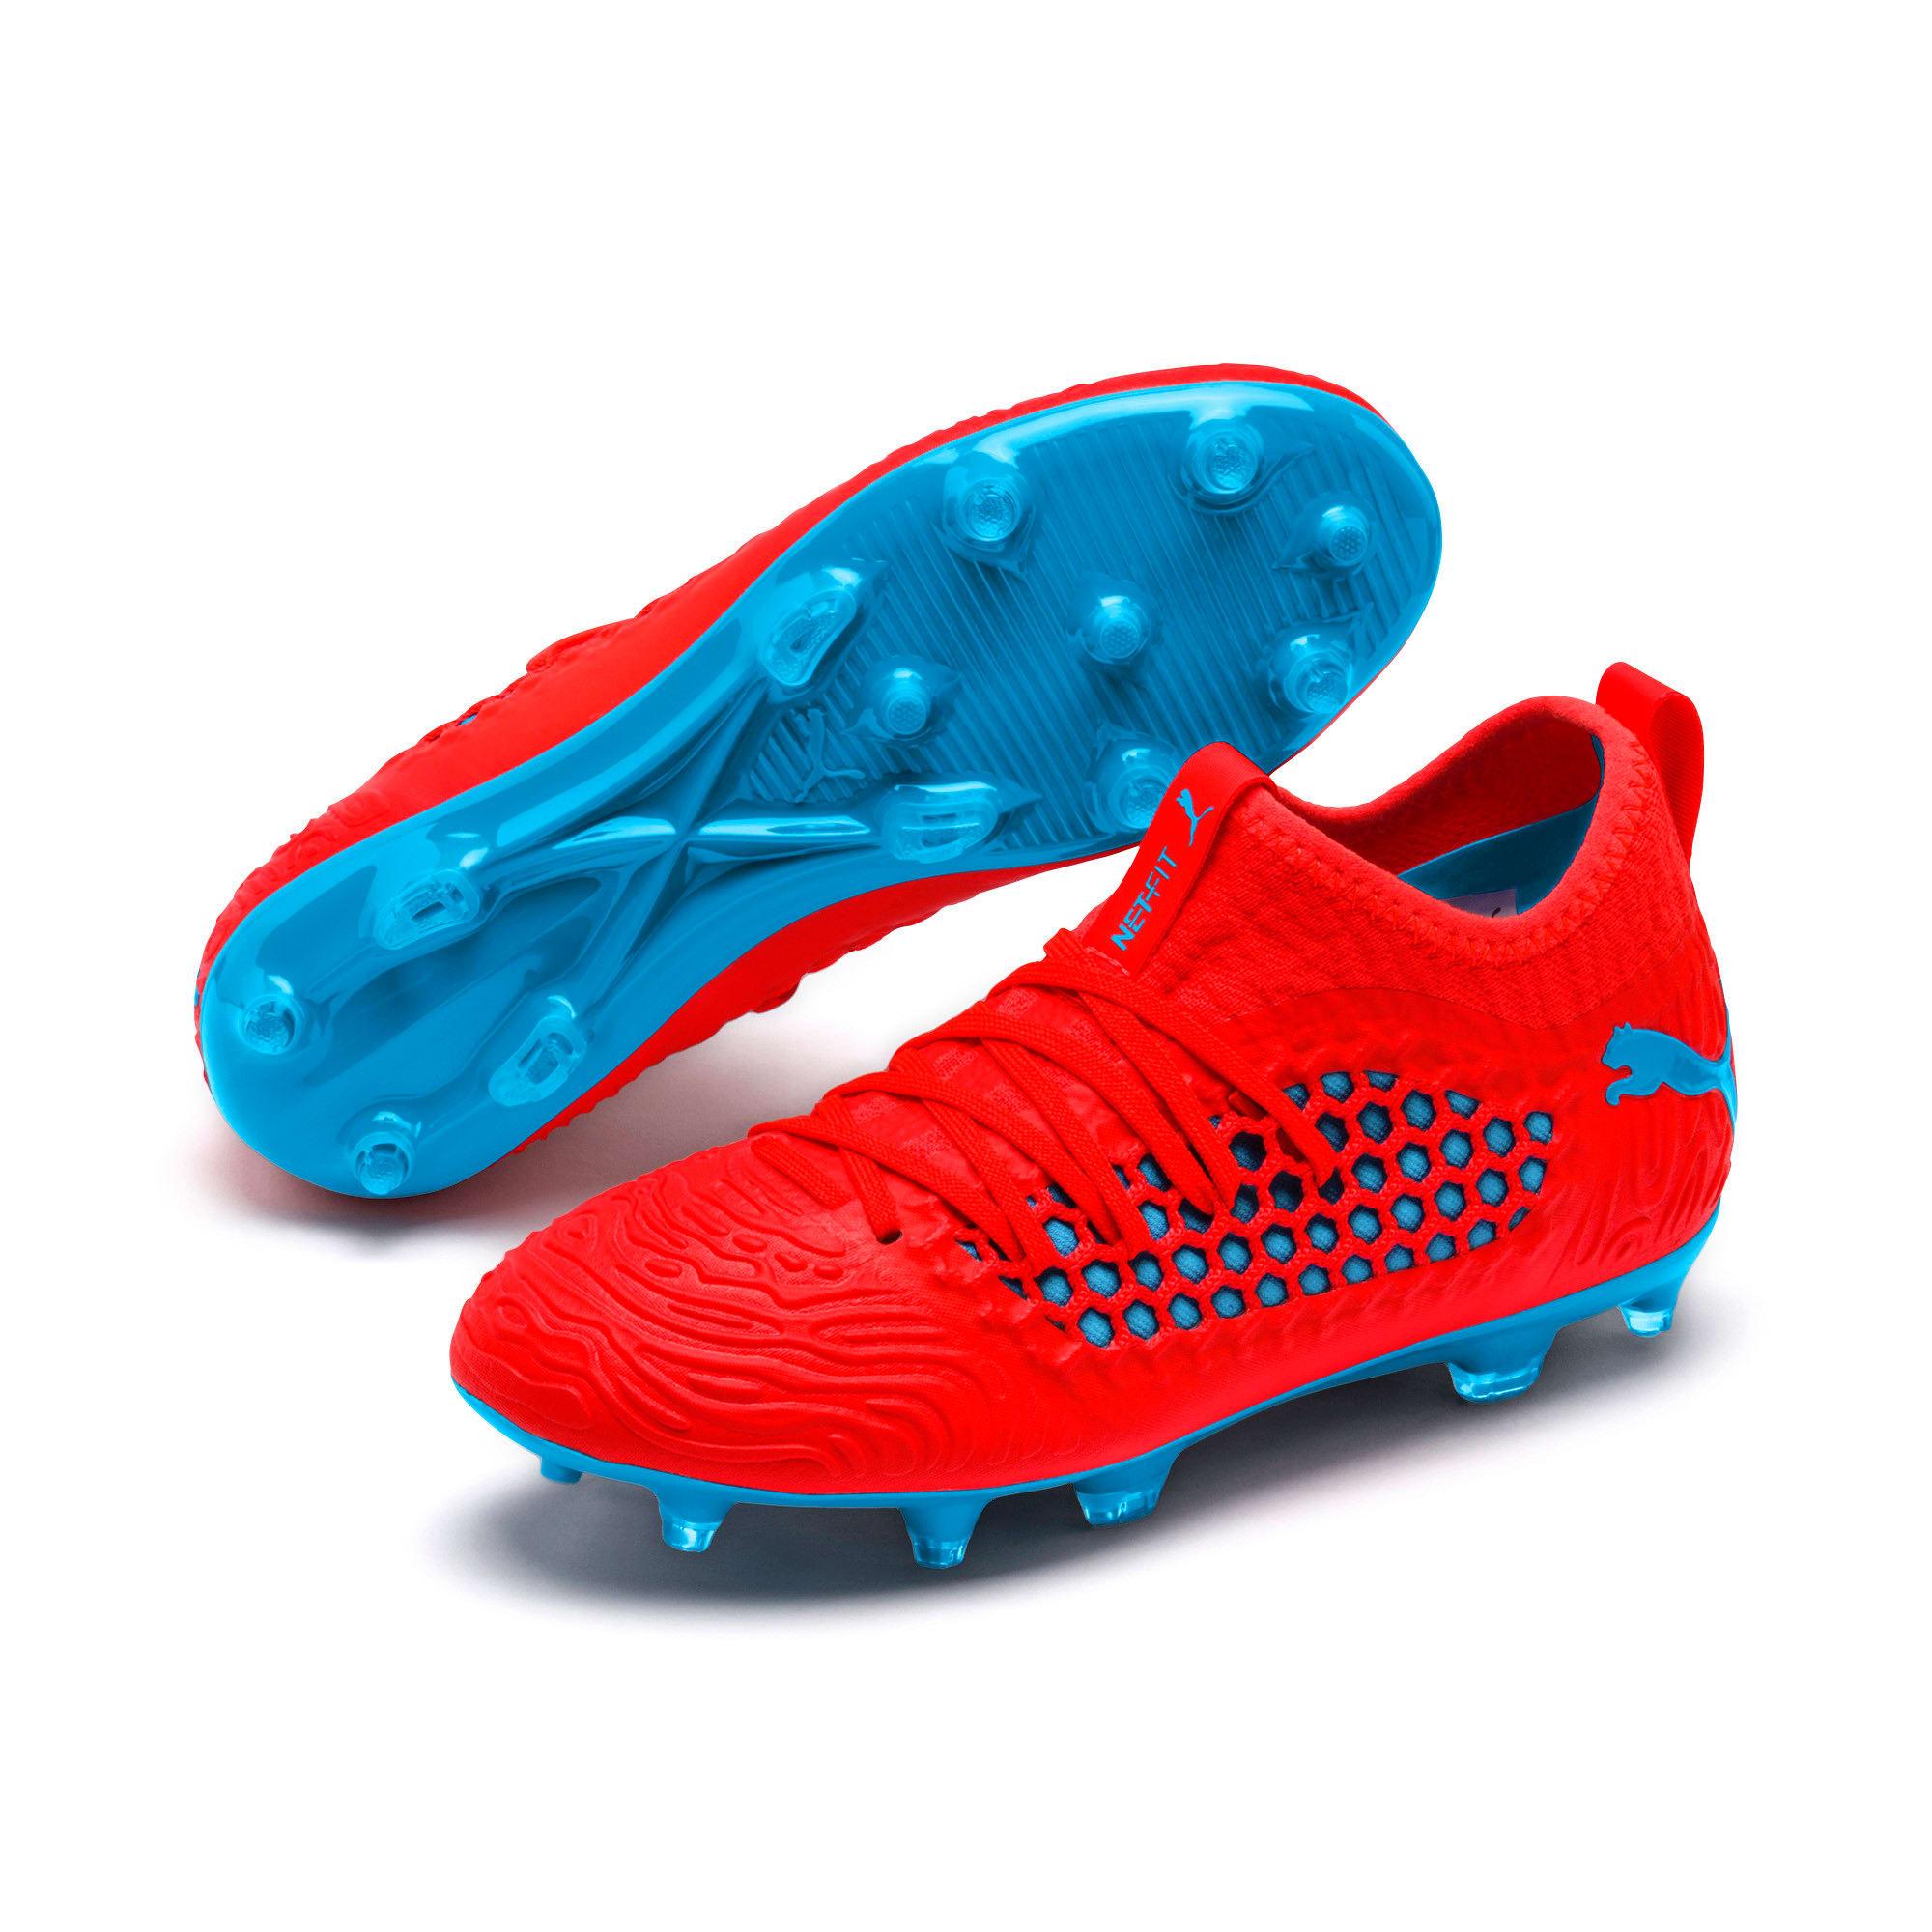 Thumbnail 2 of FUTURE 19.3 NETFIT FG/AG Soccer Cleats JR, Red Blast-Bleu Azur, medium